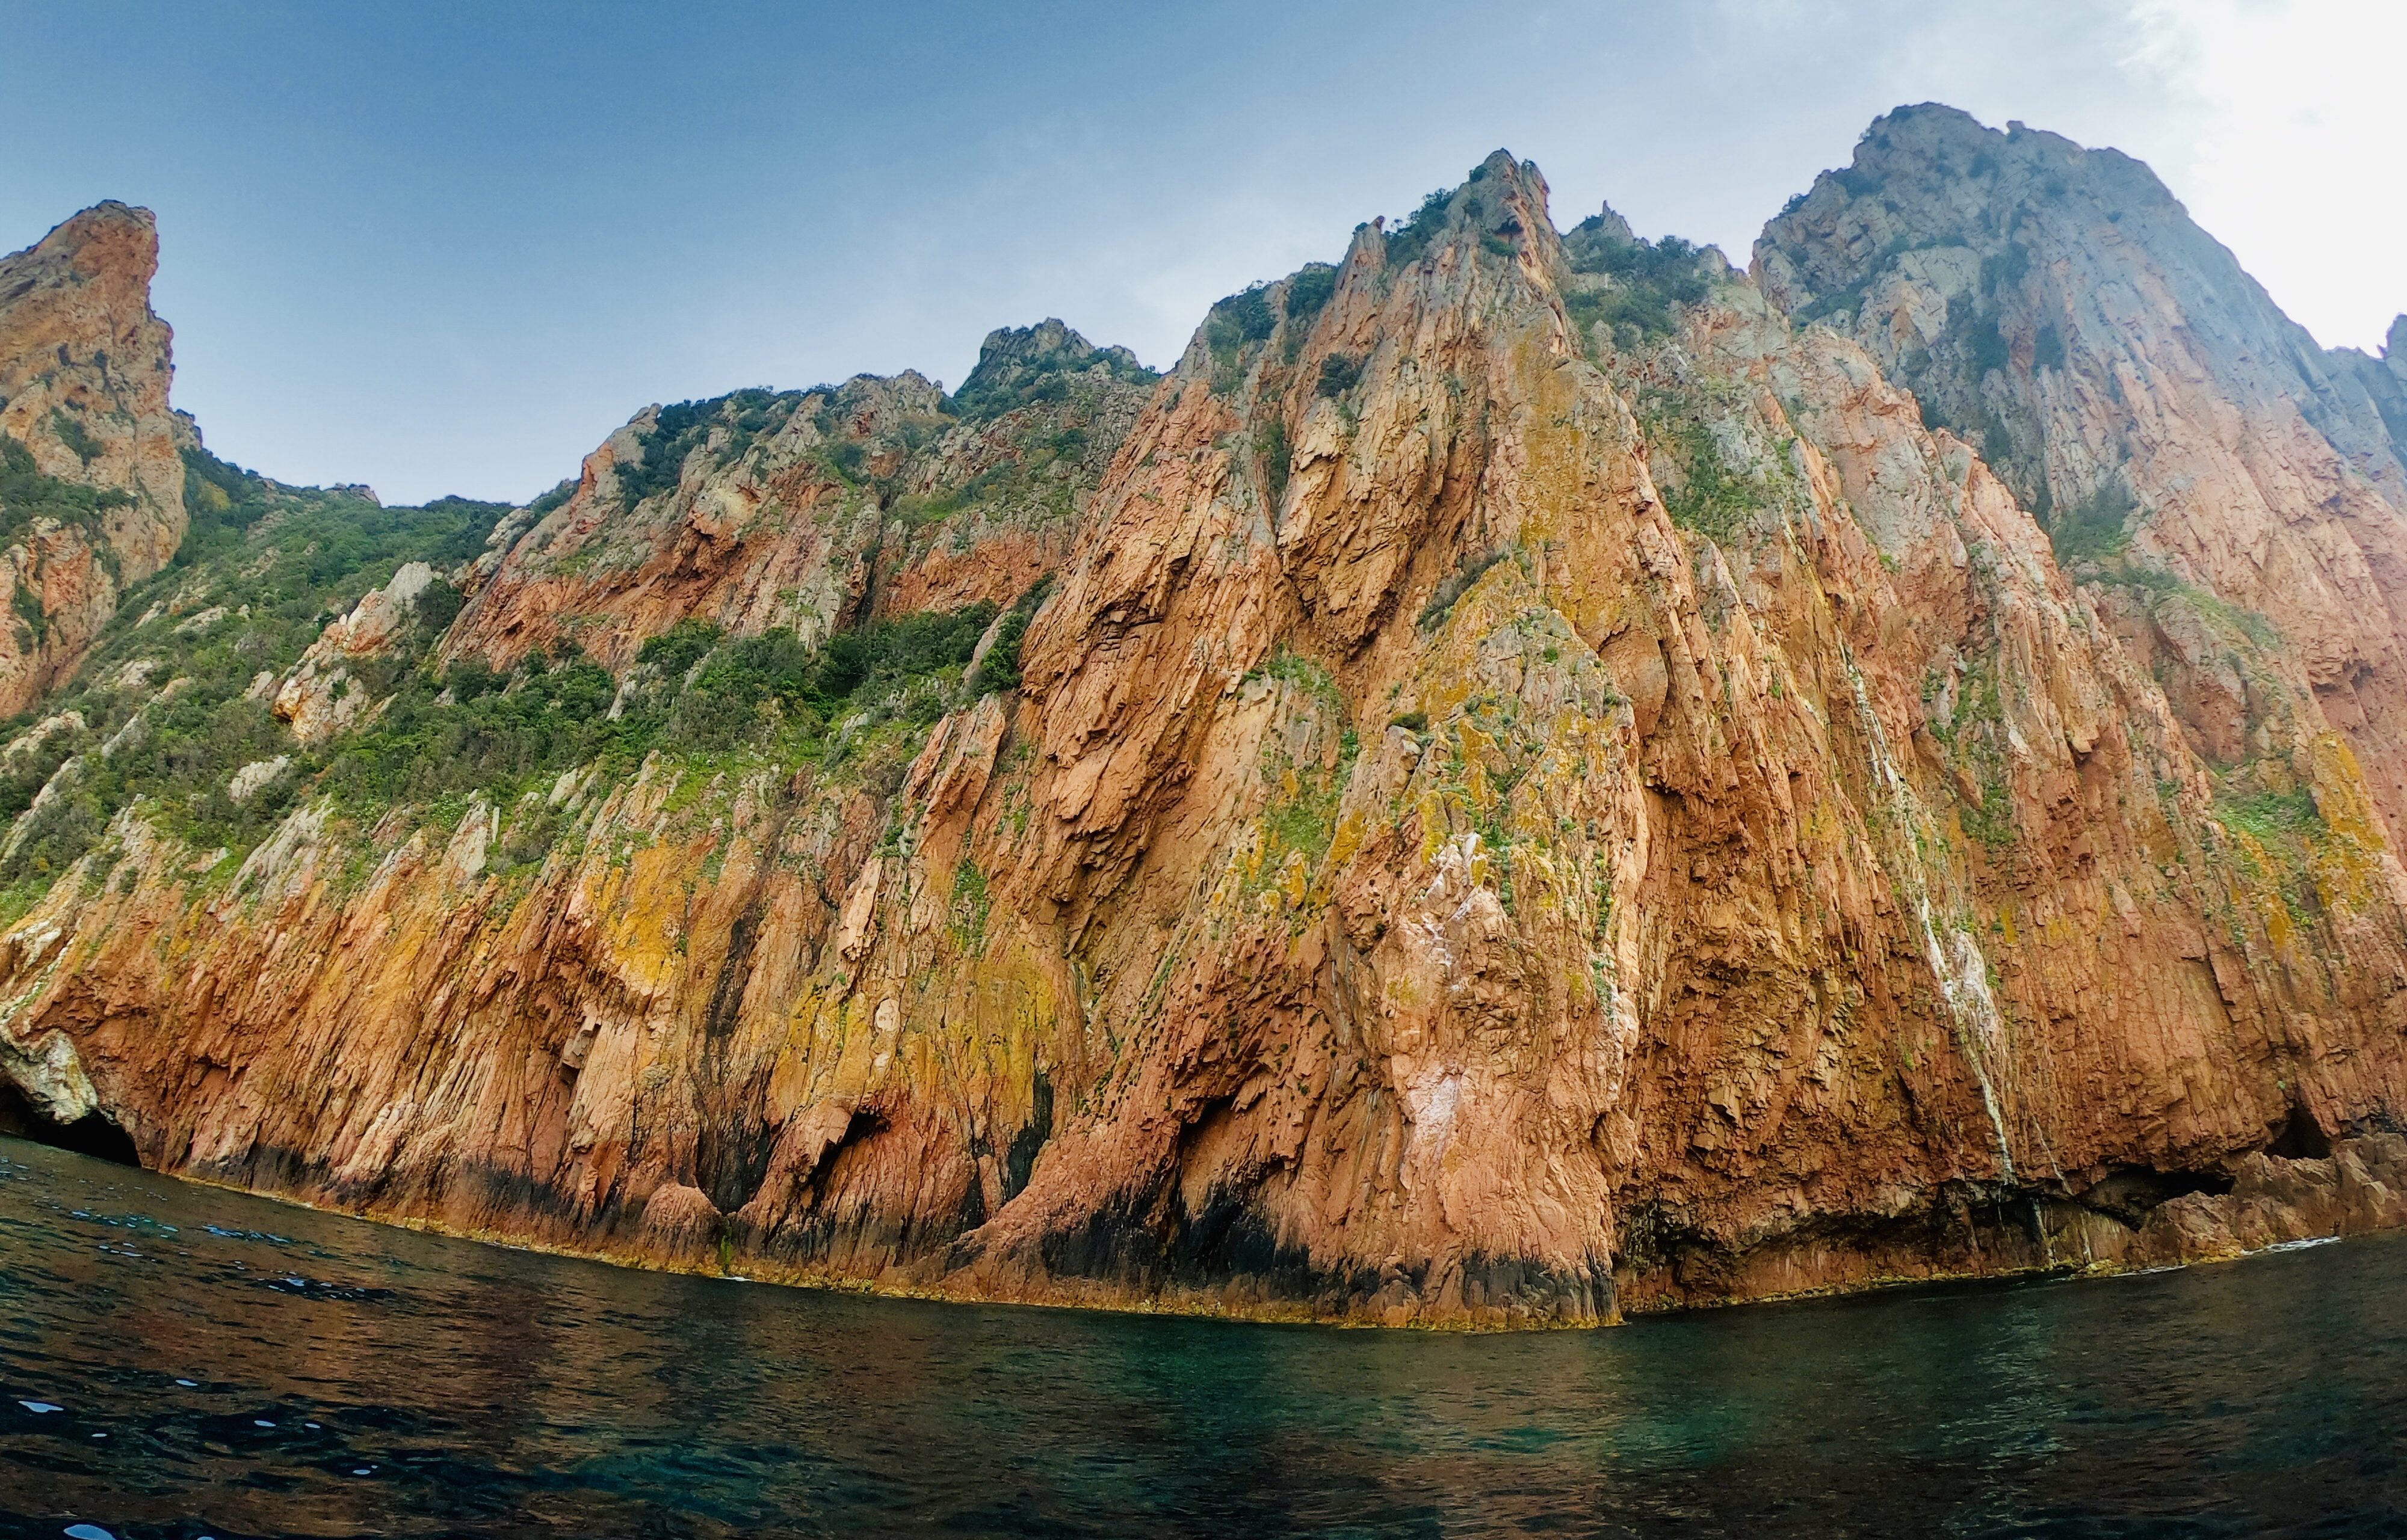 Bootstour zu den Calaques-Felsen und dem Capu Rosso